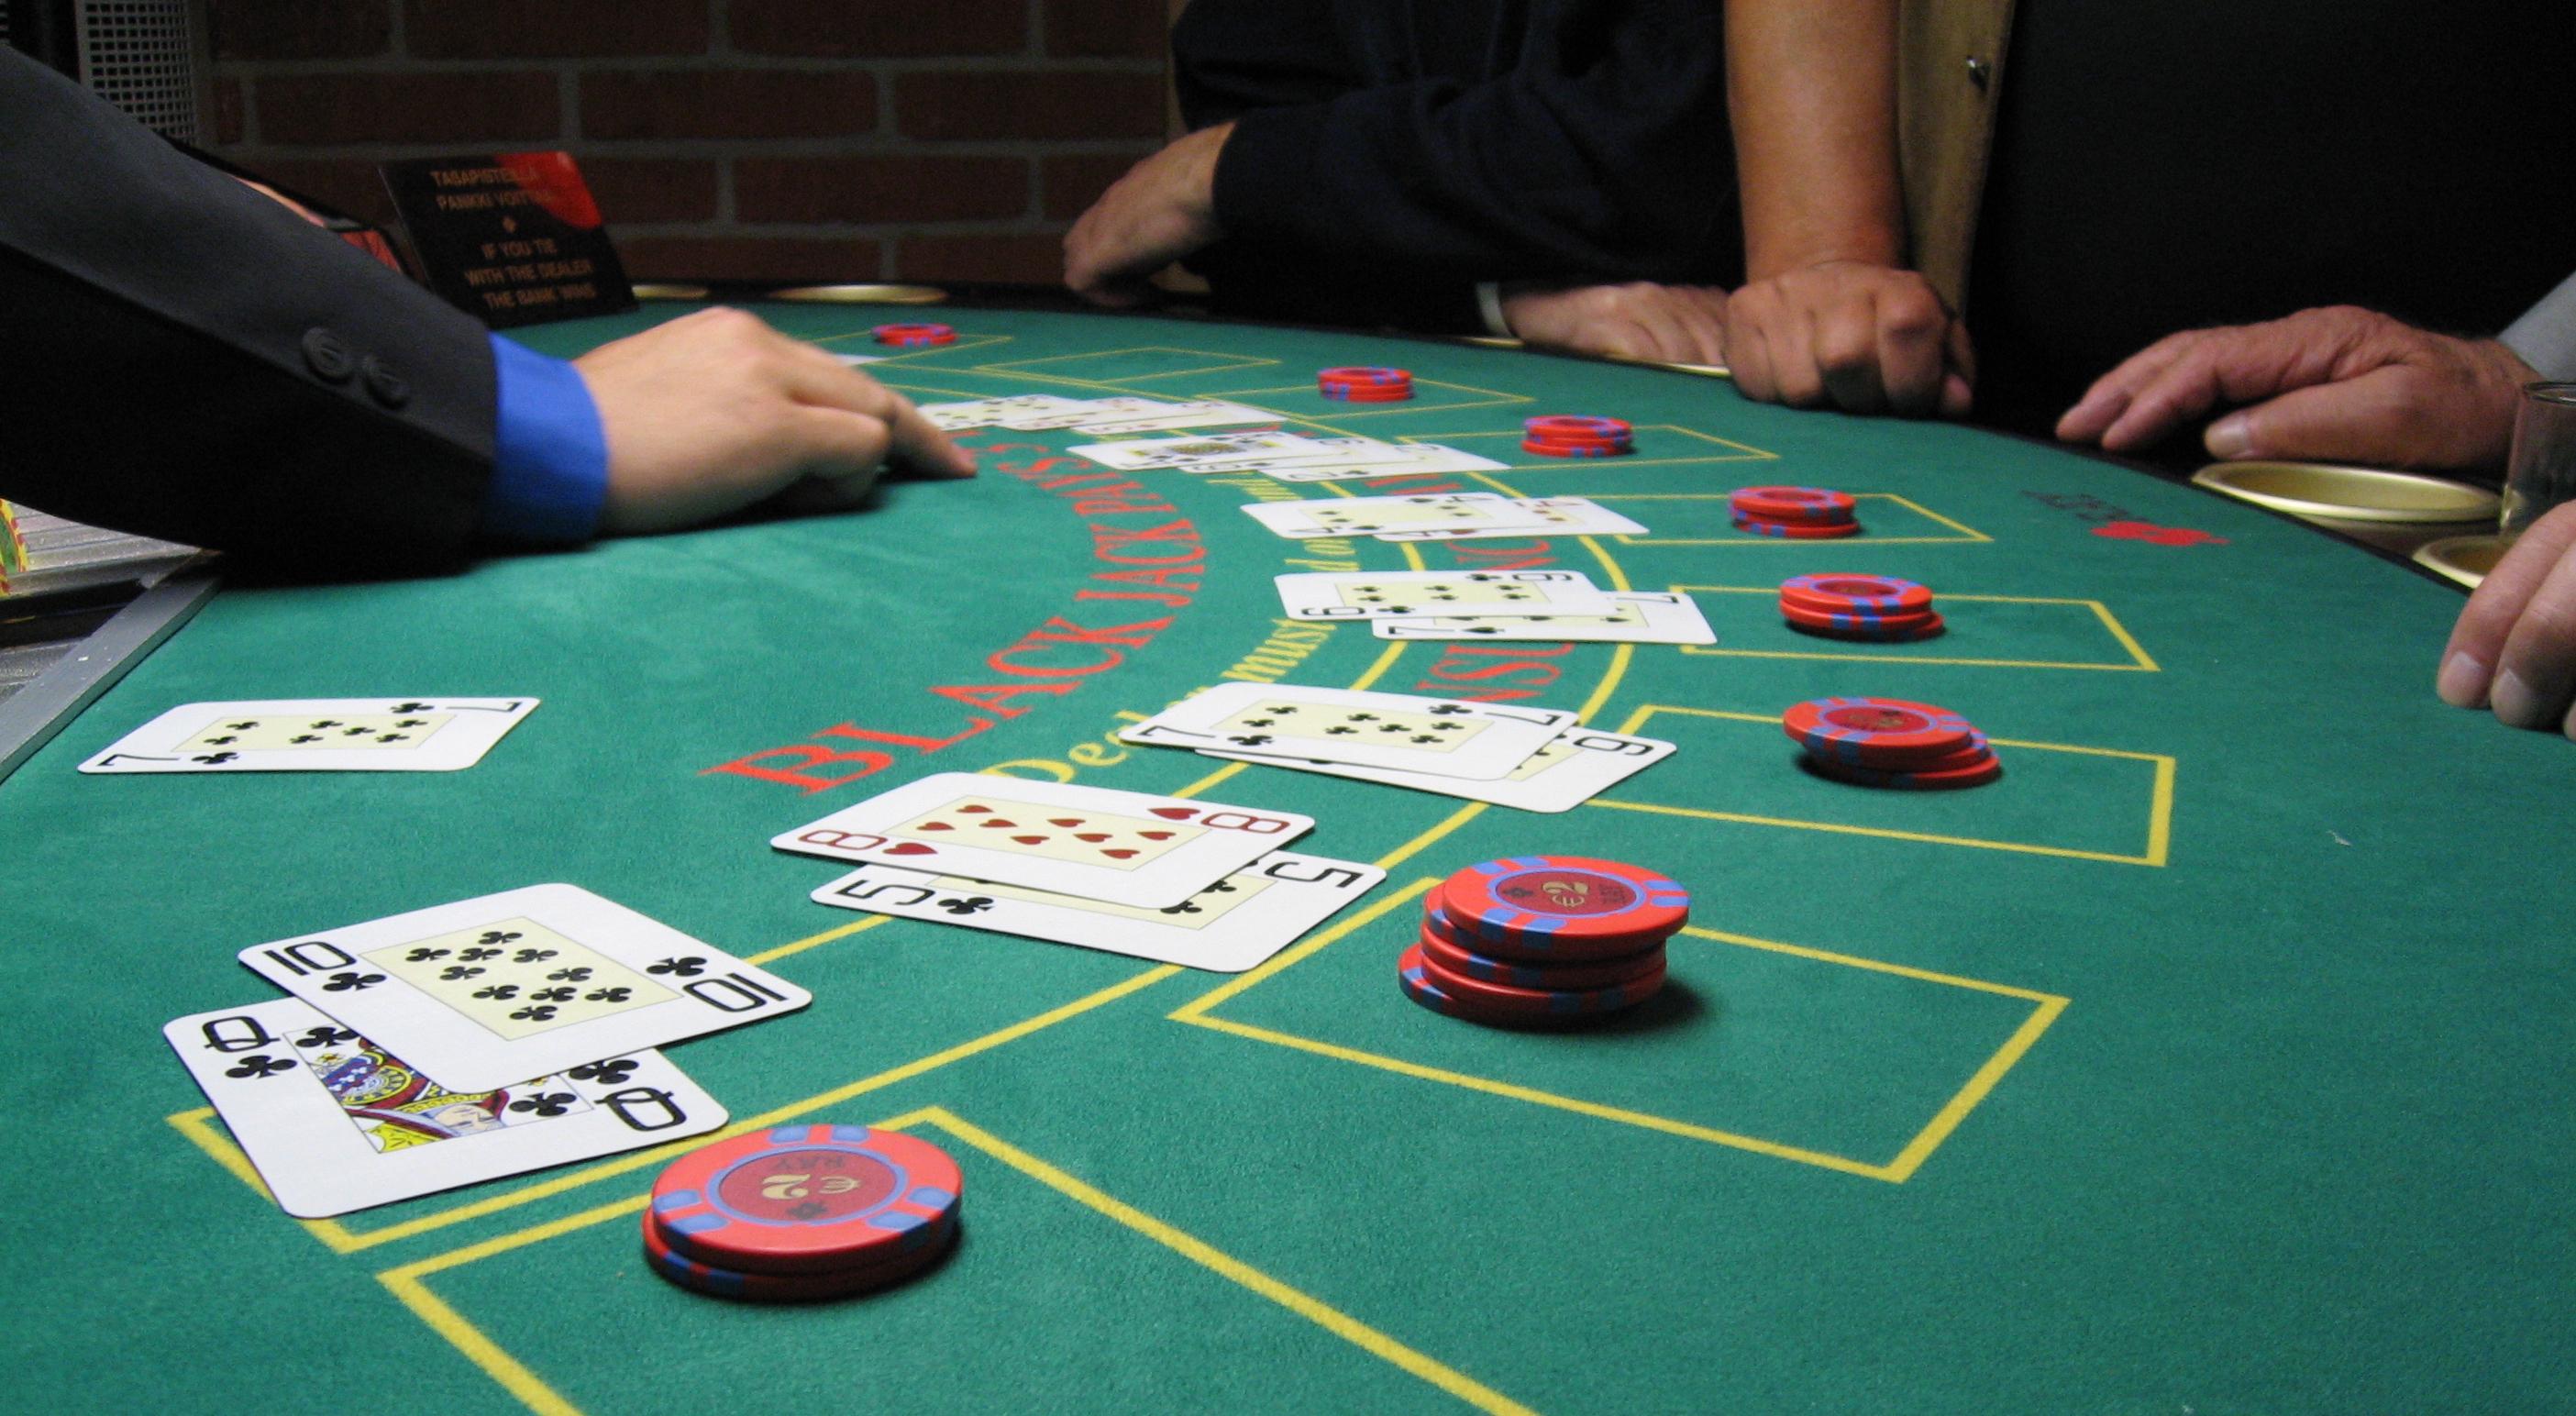 blackjack kartenwerte_online kasino_21 kartenspiel_BJ 21 strategy_Martingal_1-3-2-6-system